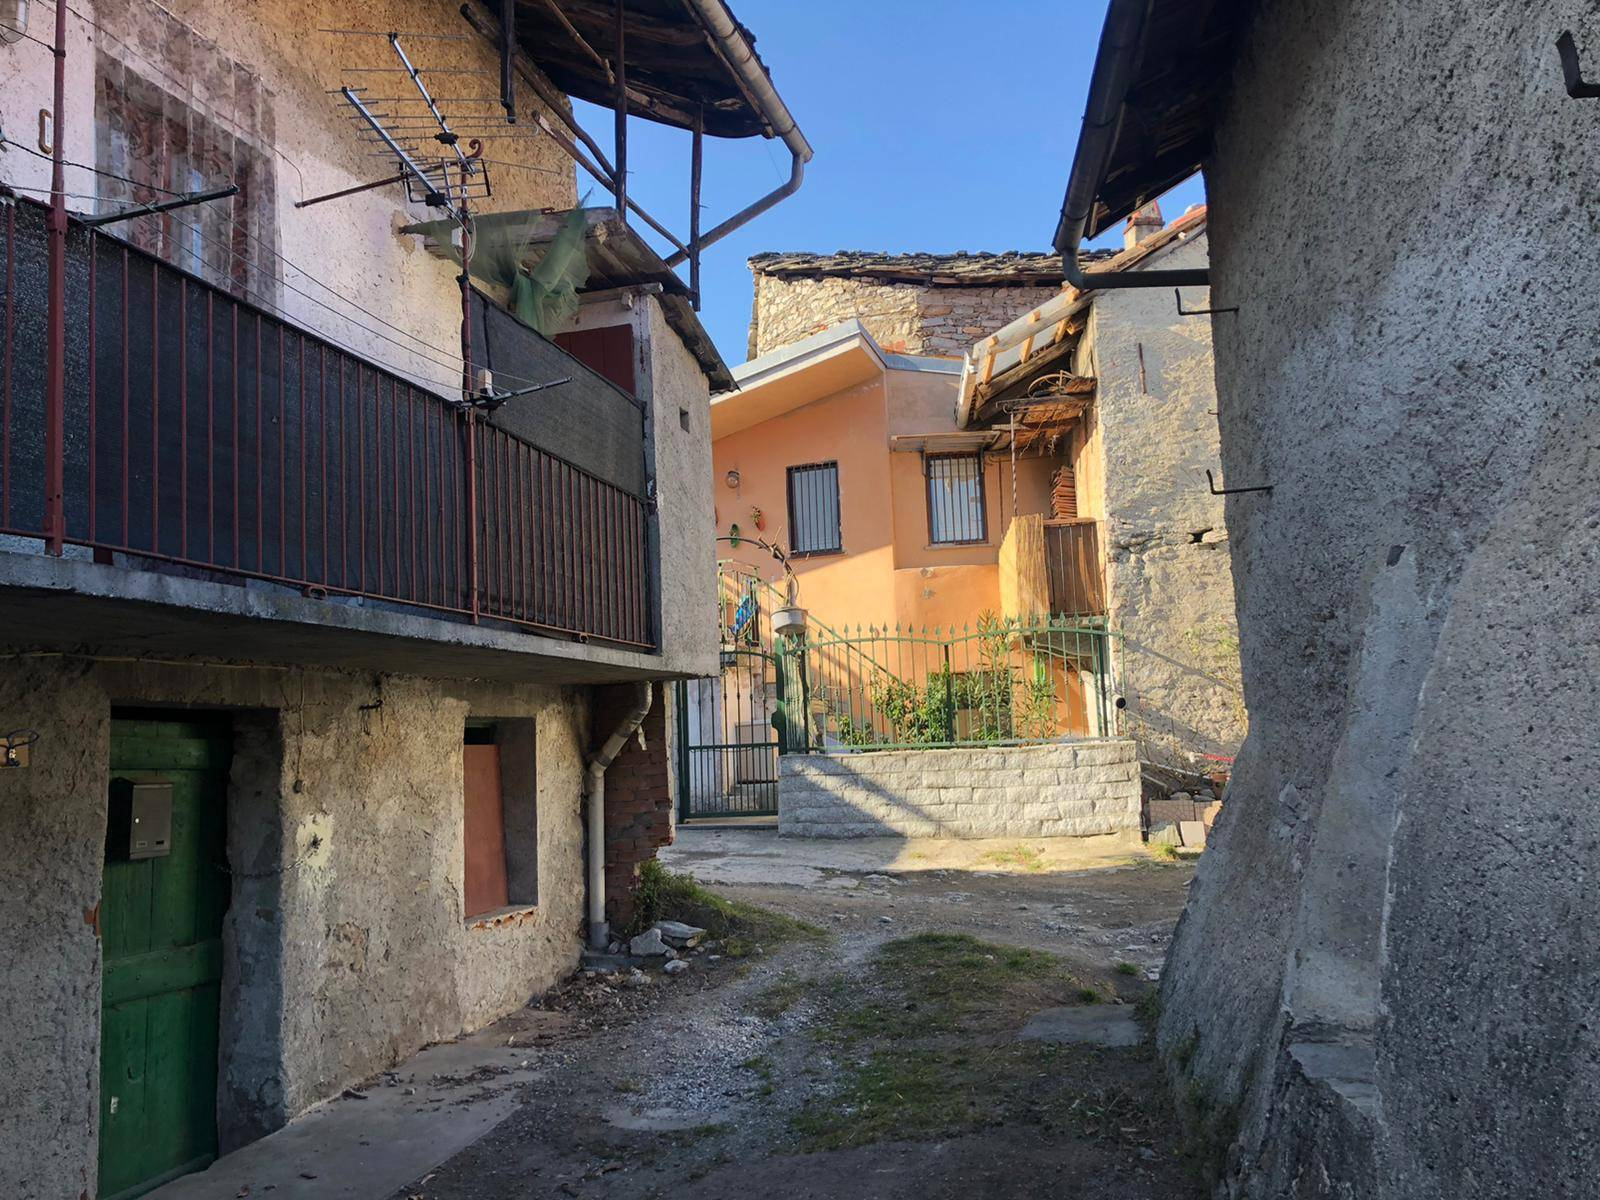 Villar Focchiardo (TO): Casa Semindipendente centrale con cortile